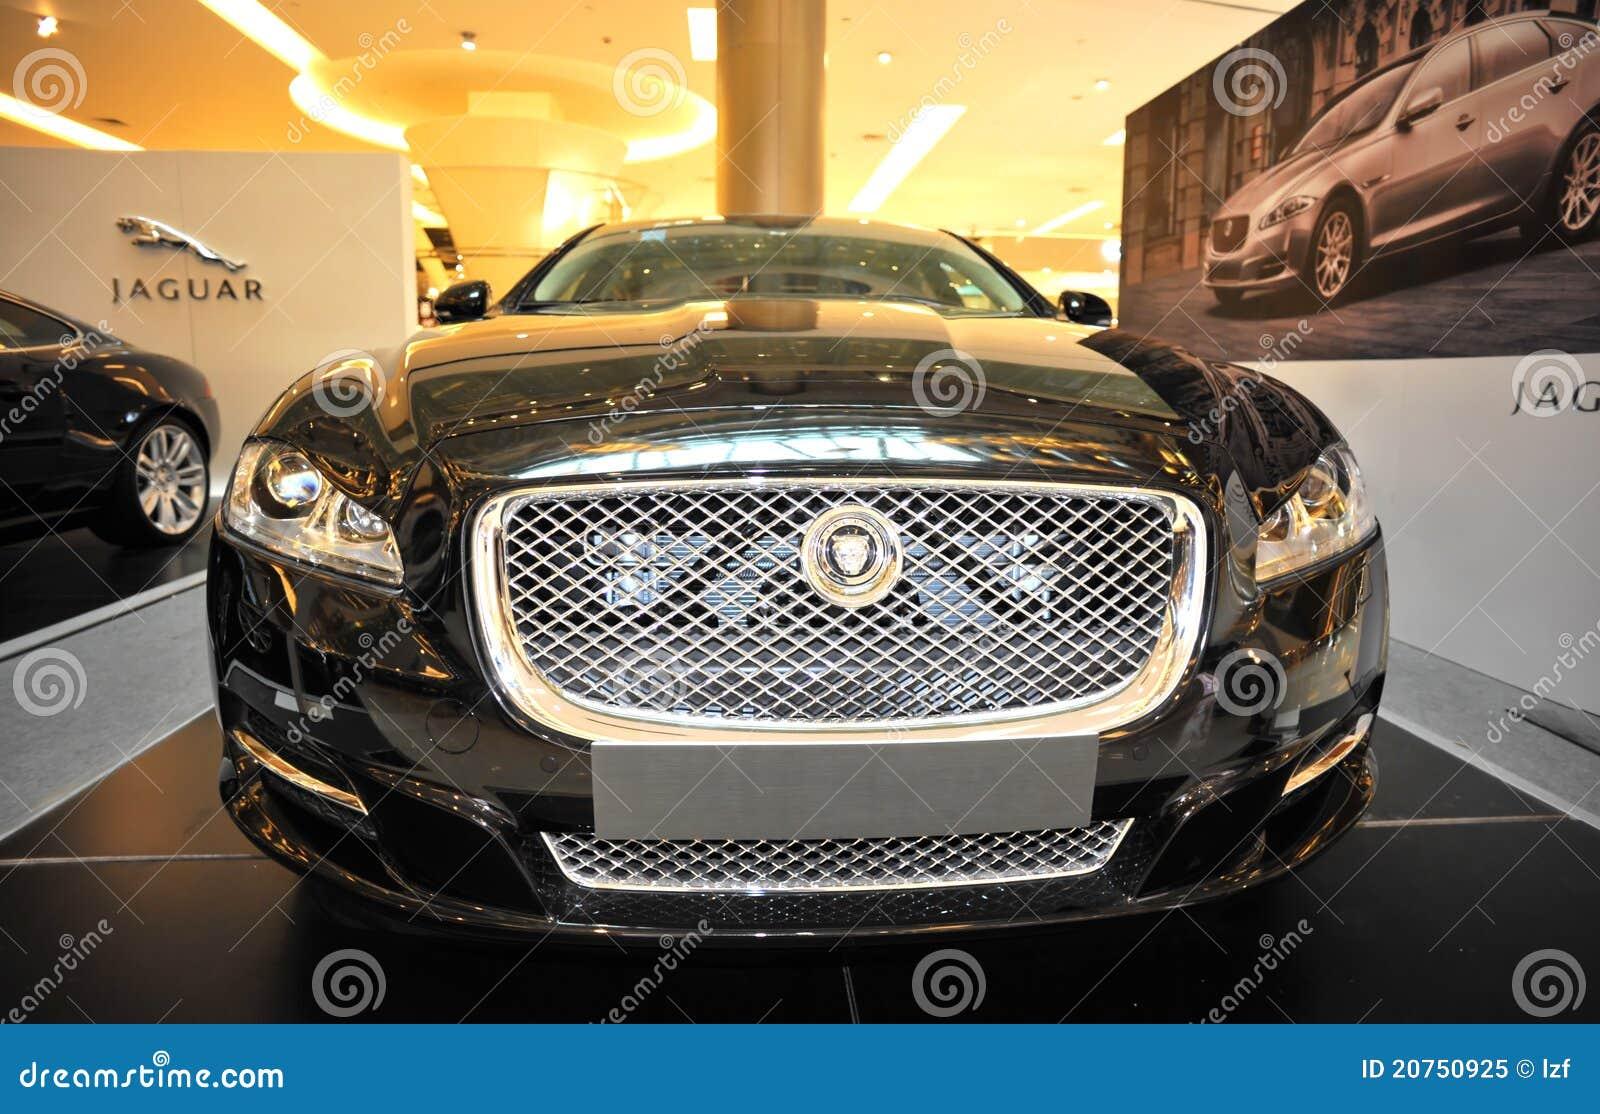 jaguar luxury car interior editorial image 92107778. Black Bedroom Furniture Sets. Home Design Ideas